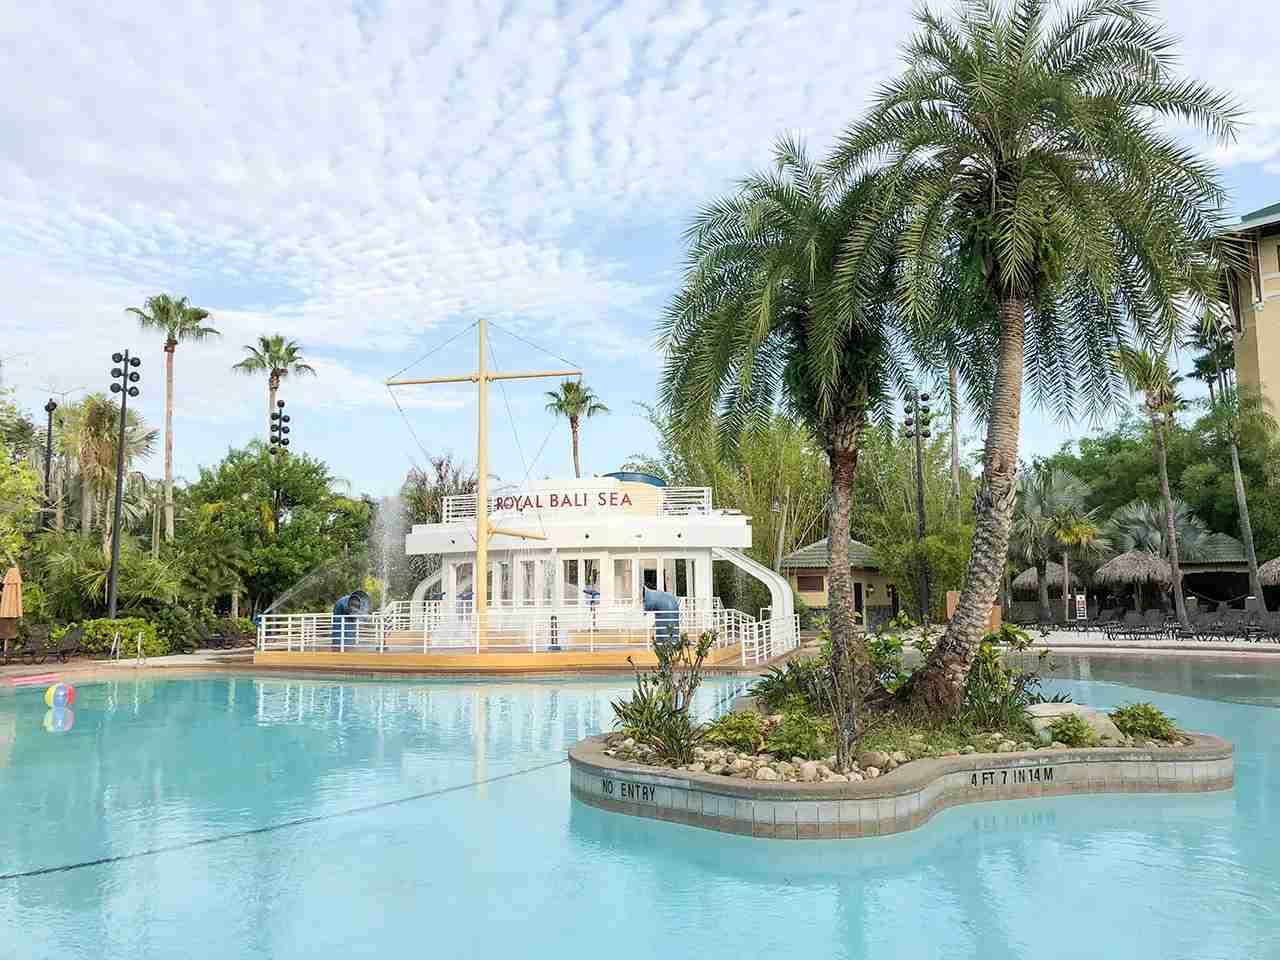 Pool at Loews Royal Pacific - get free Express Unlimited Passes